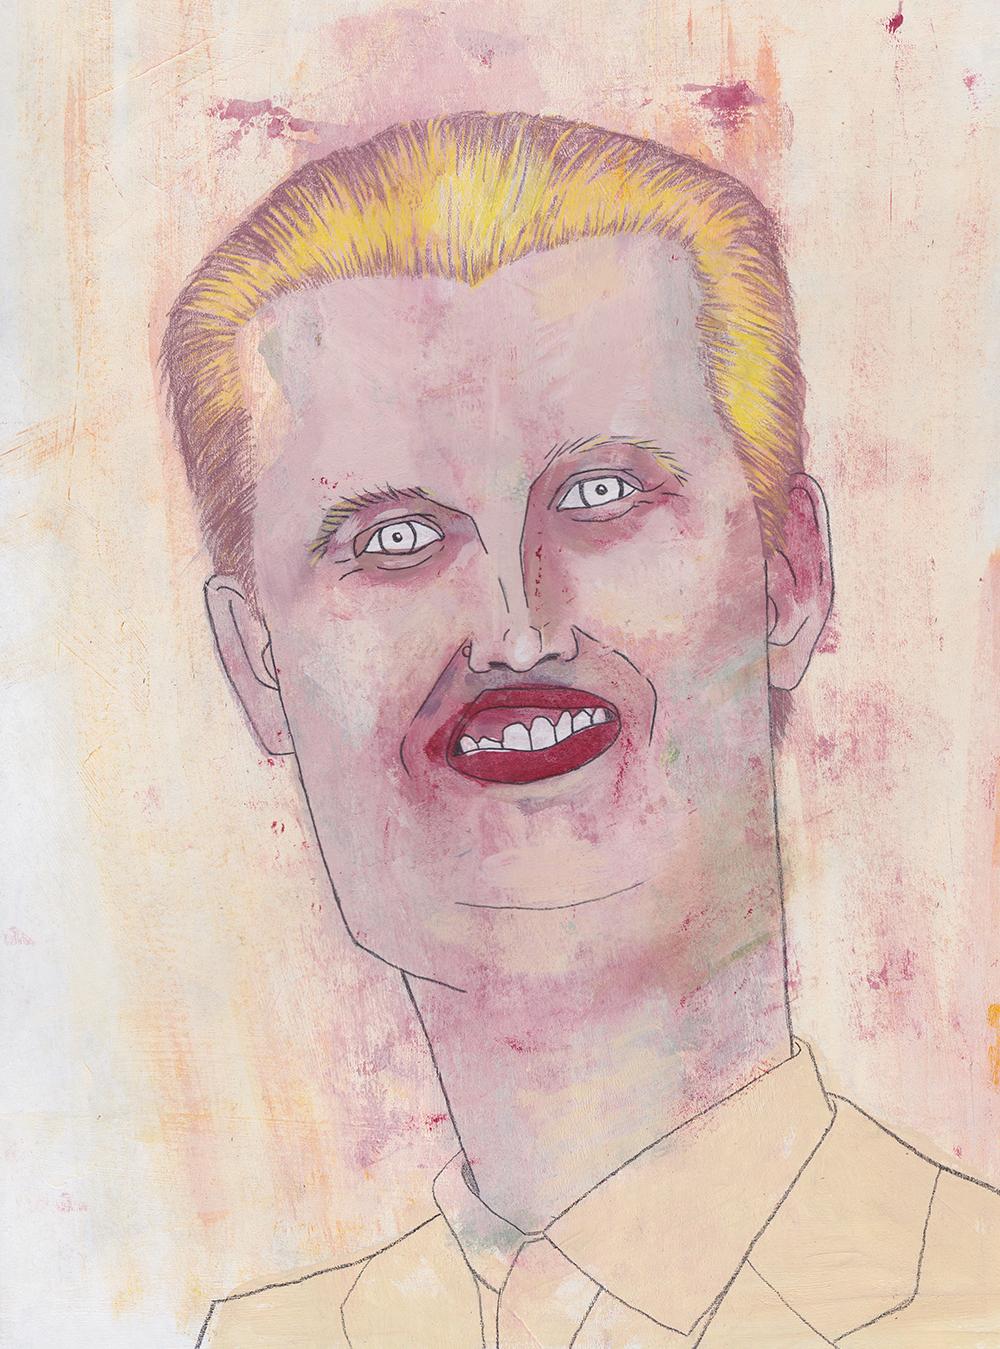 Eric Trump  acrylic, graphite and colored pencil on illustration board